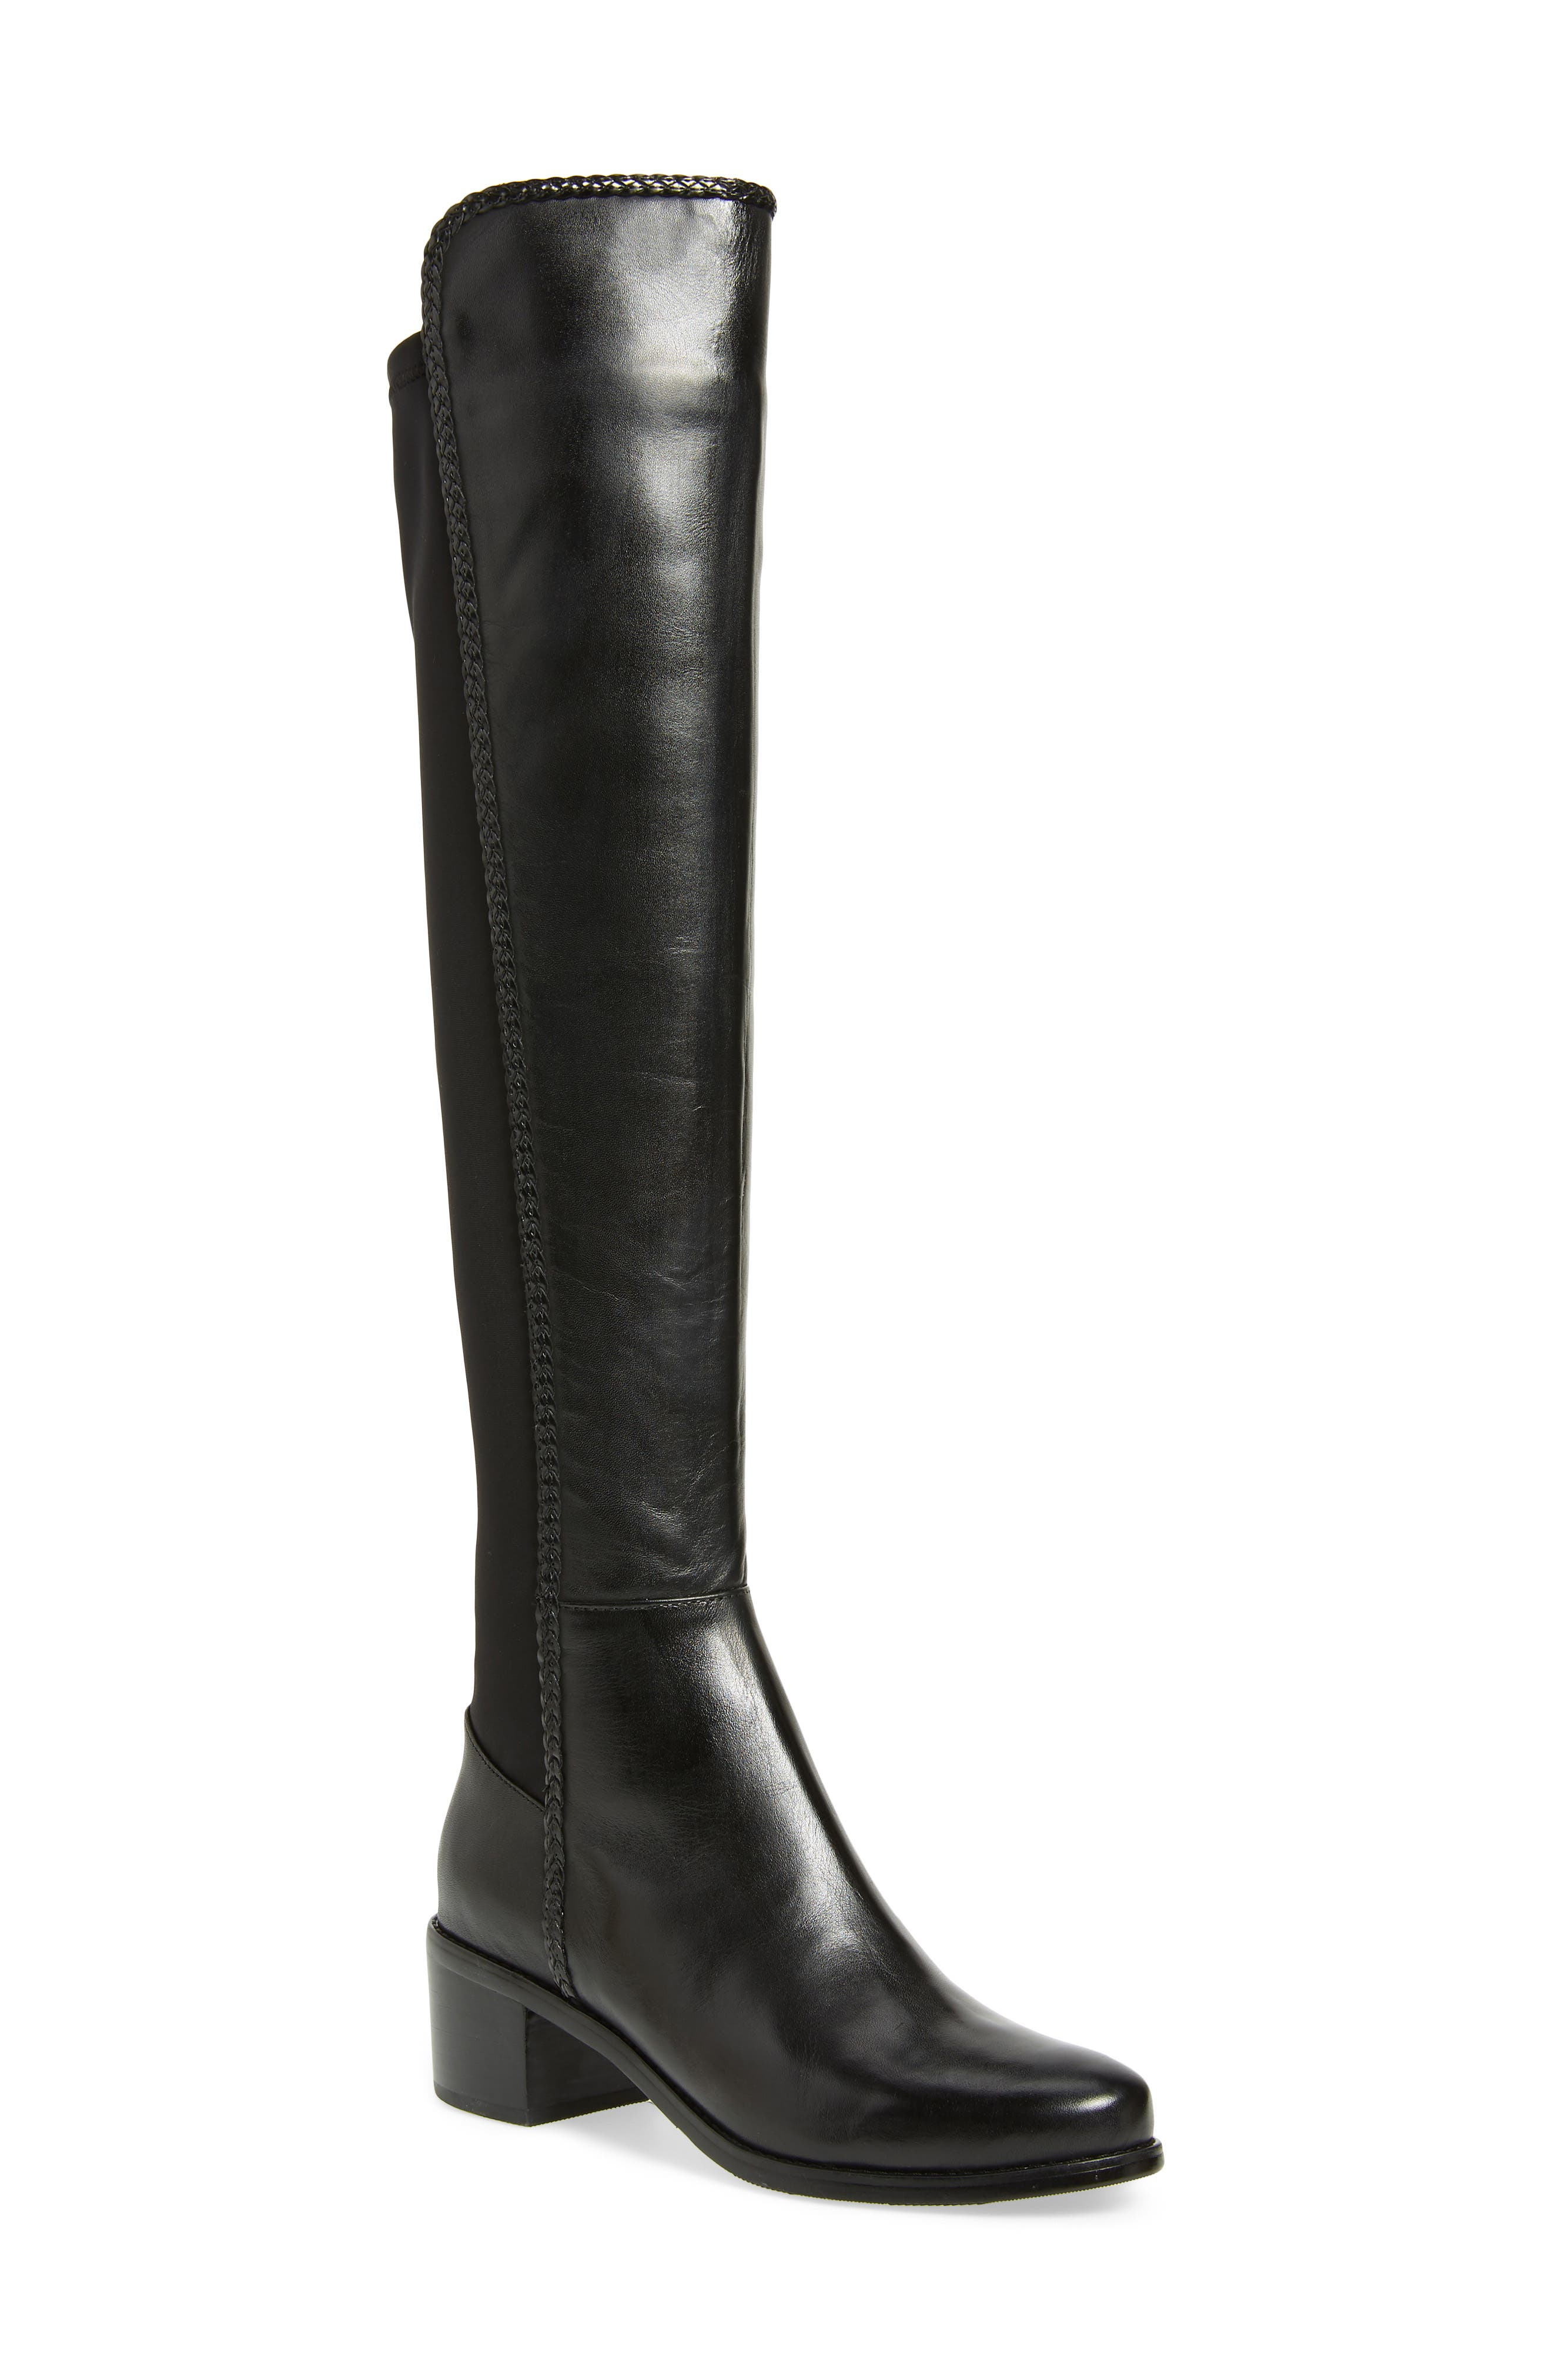 AquaDiva Florence Waterproof Over the Knee Boot (Women)